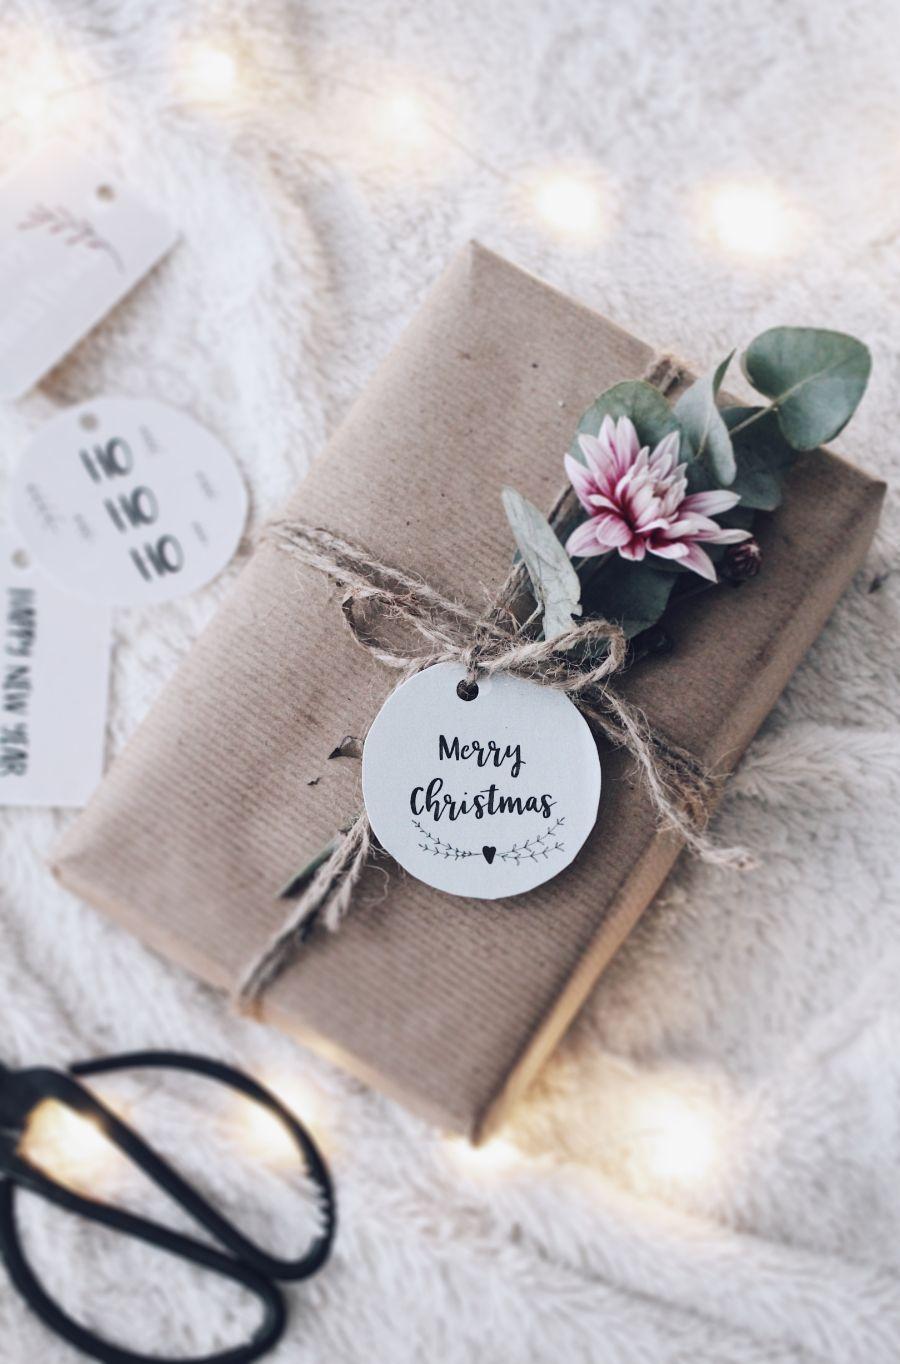 DIY Geschenke verpacken - Freebies 11 tolle Geschenke Anhänger #creativegifts